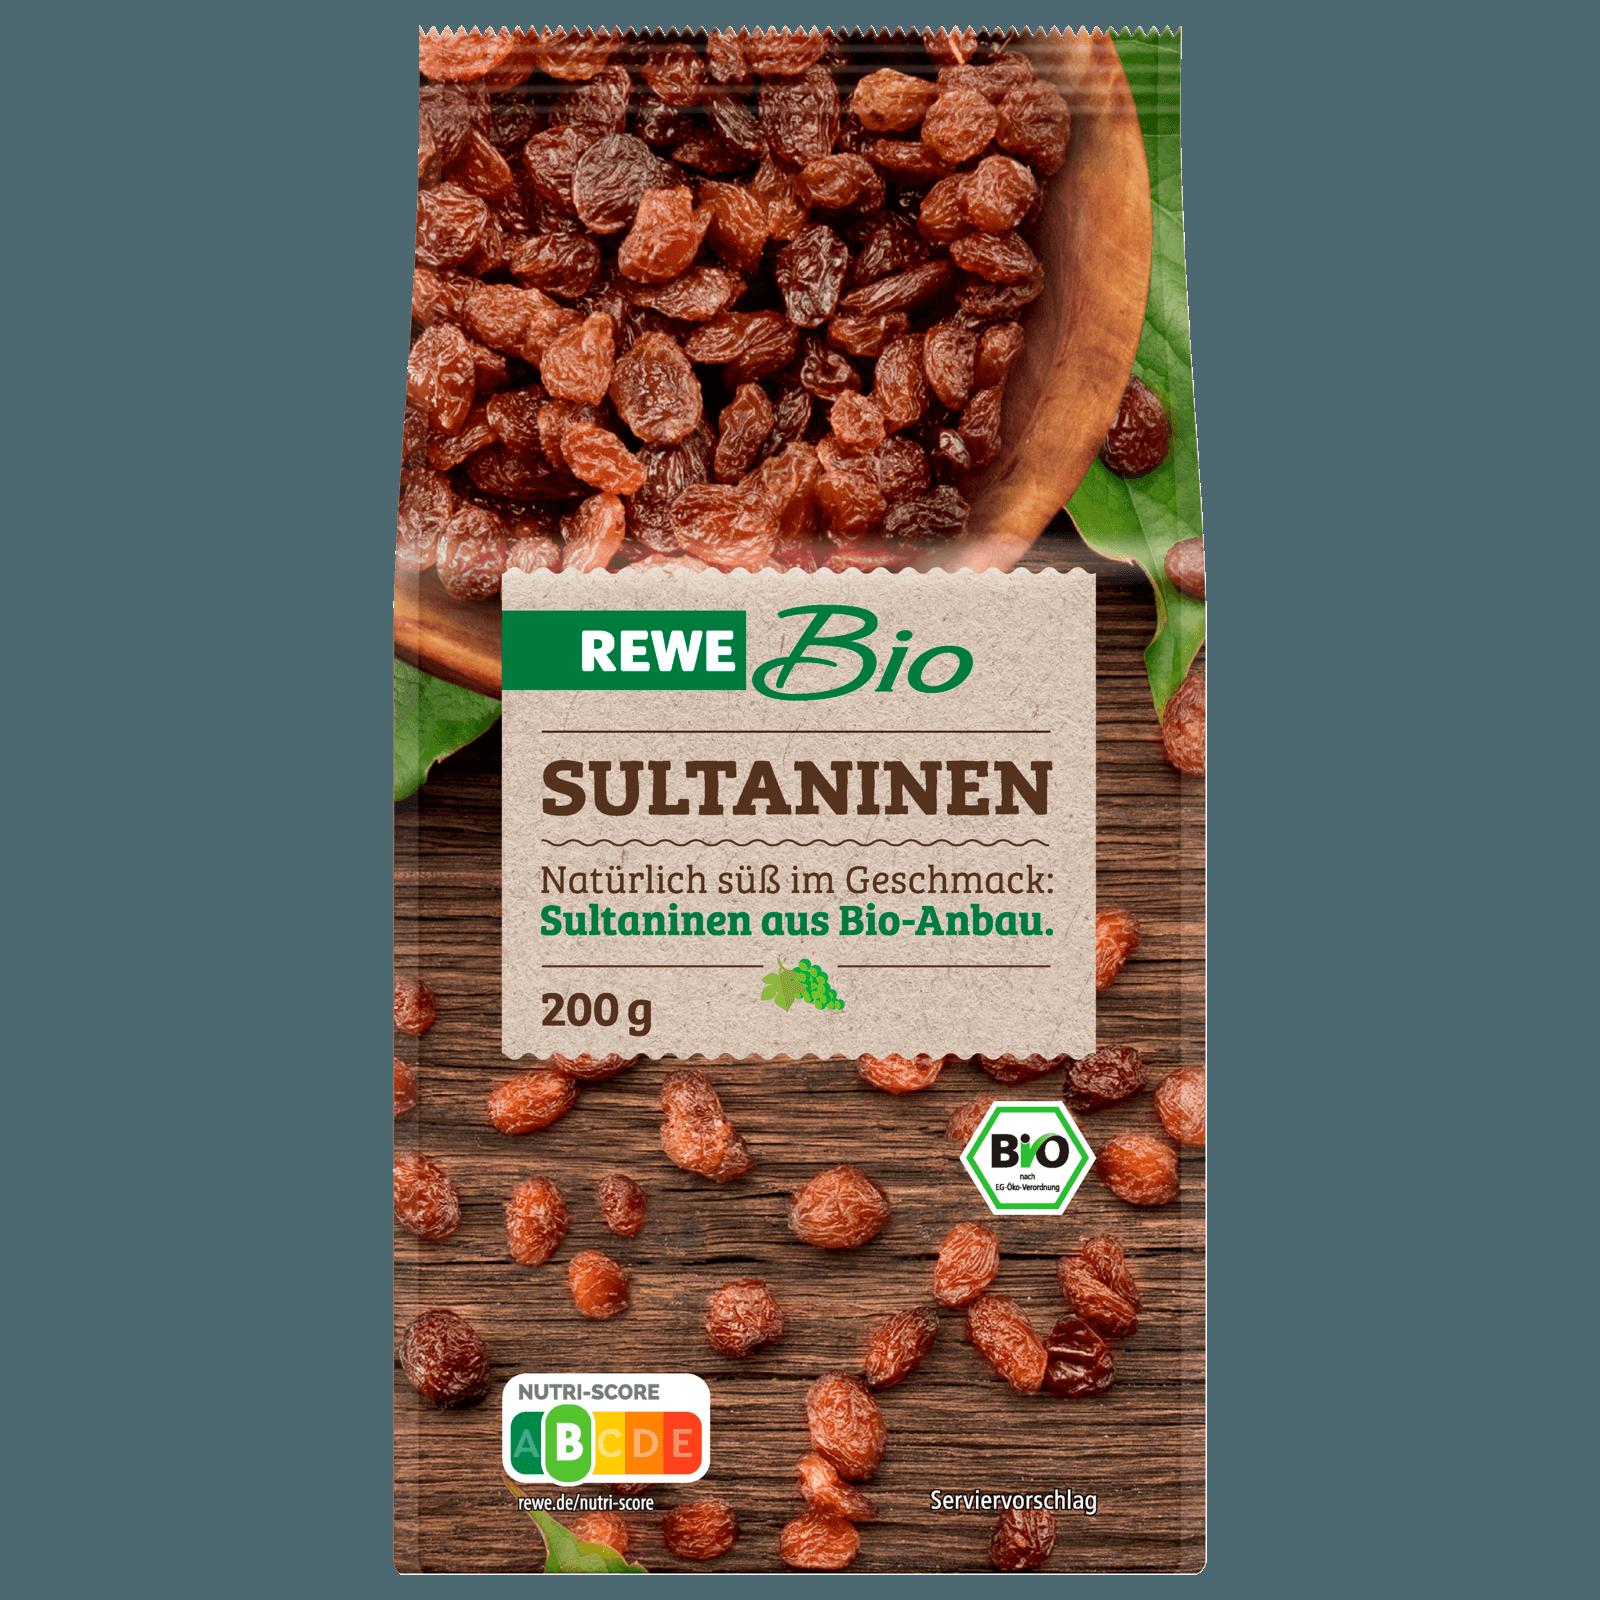 Rewe Bio Sultaninen 200g Bei Rewe Online Bestellen